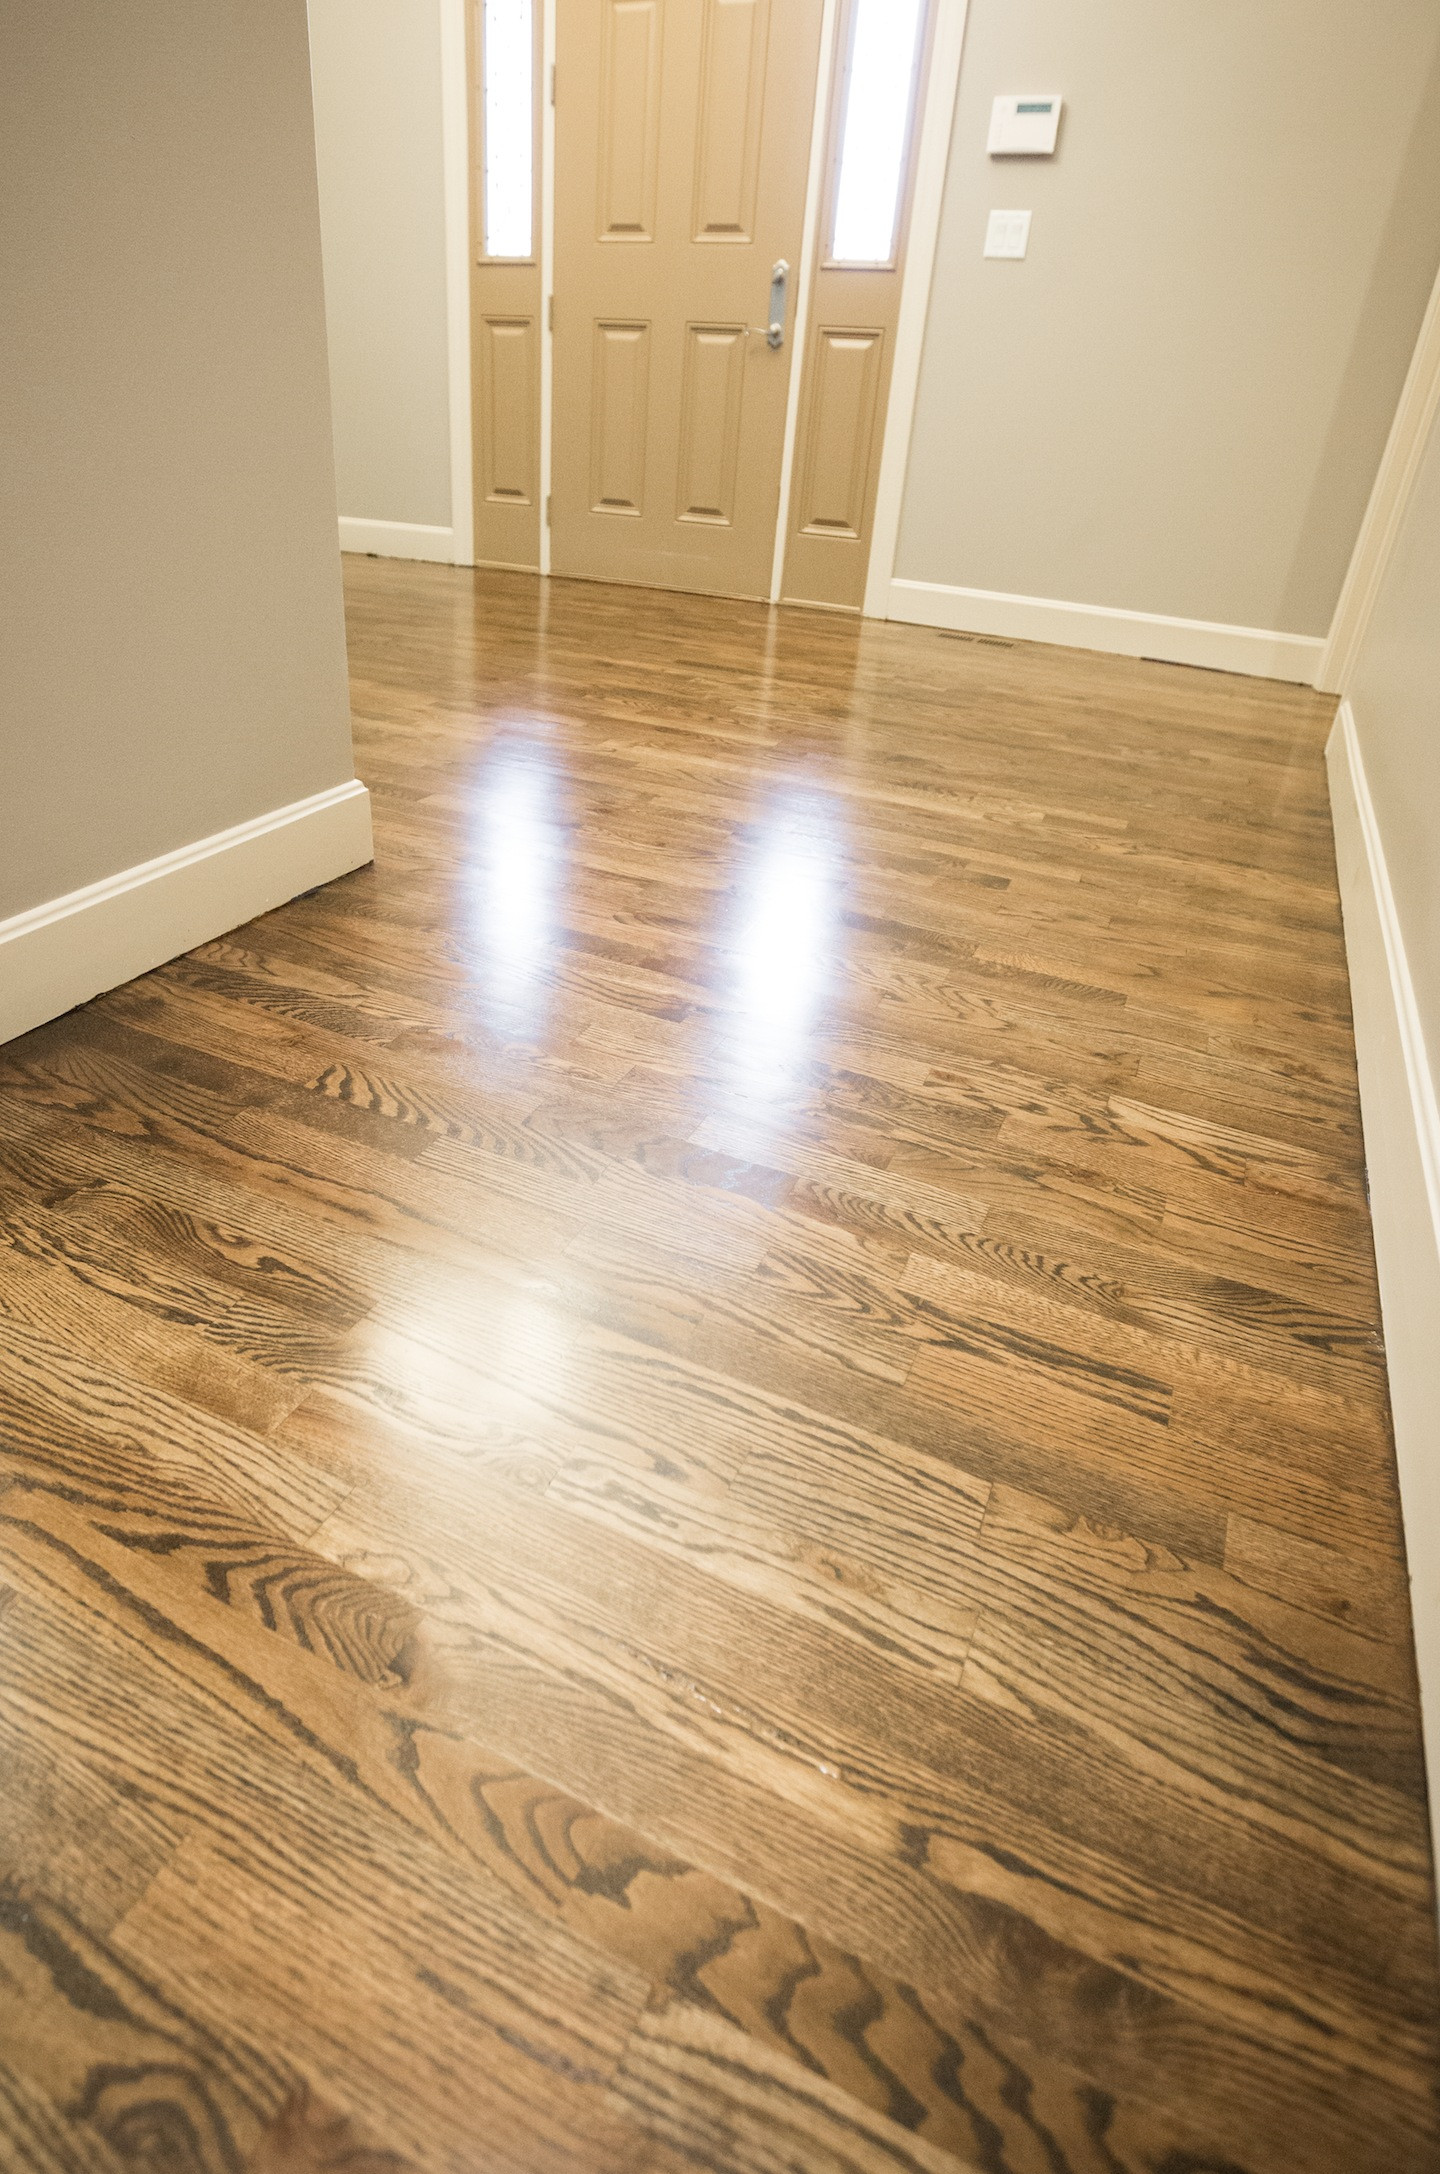 maple amber hardwood flooring of premier laminate flooring fresh piedmont oak is a versatile warm inside premier laminate flooring new premier hardwood floors 27 best dark hardwoods pinterest stock of premier laminate